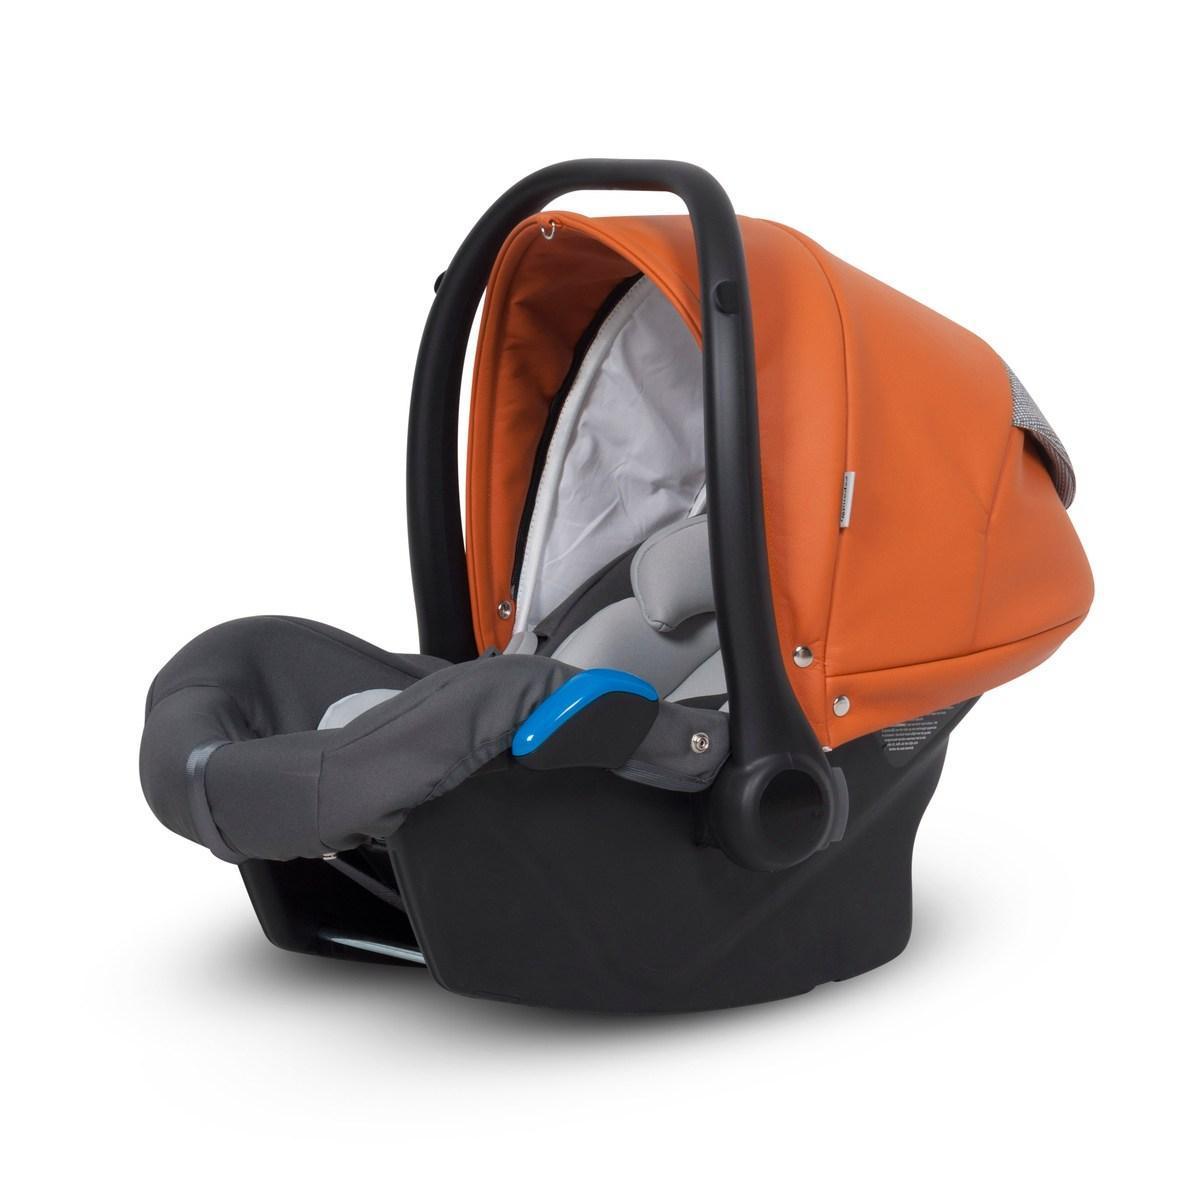 Детское автокресло Expander Xenon 02 Copper